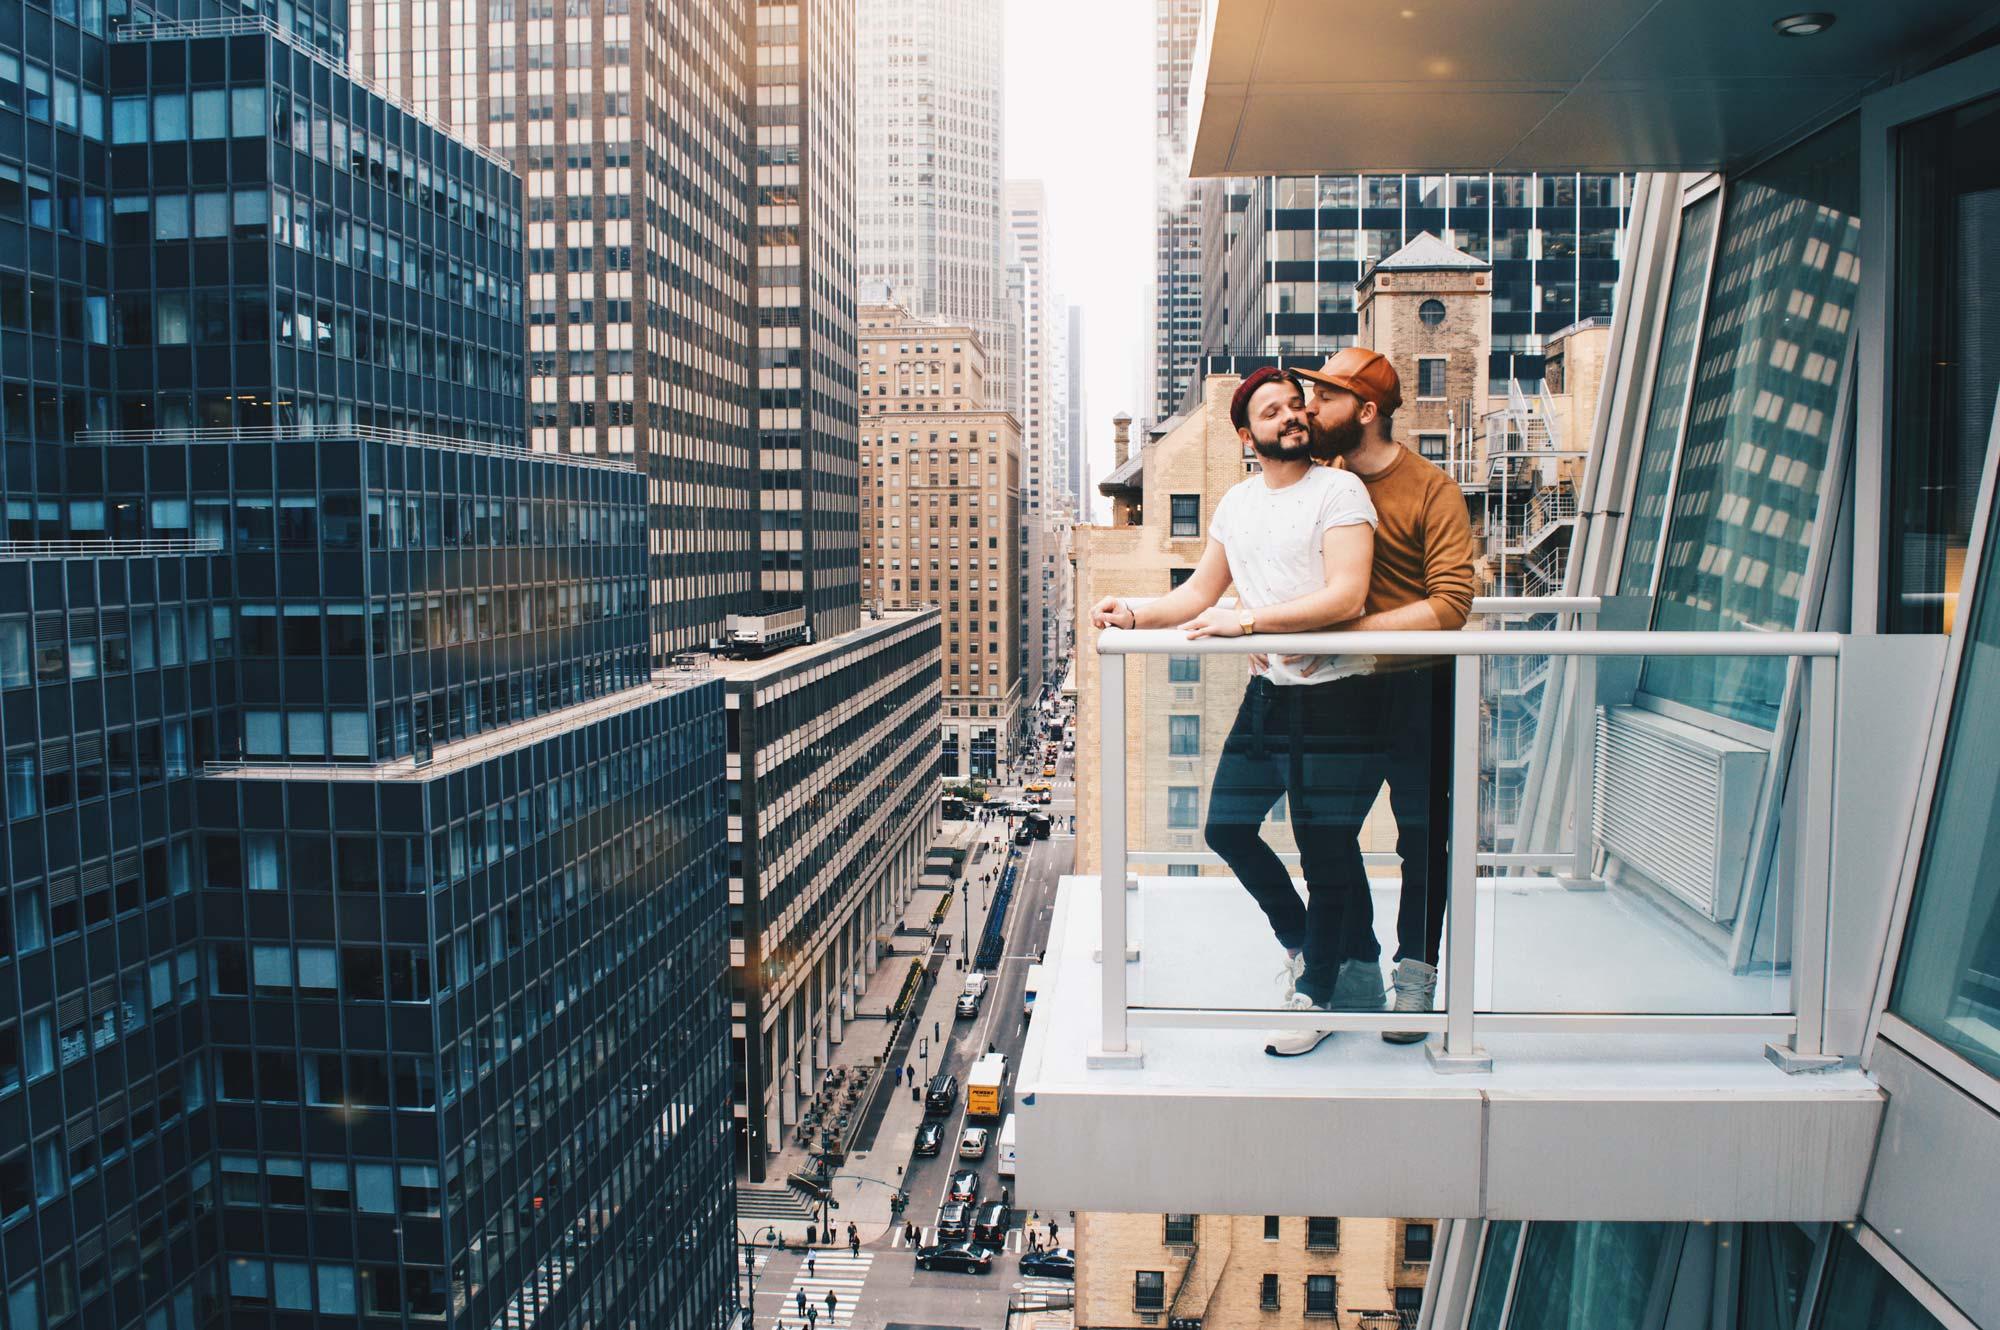 A gay kiss in Manhattan New York City for World Pride 2019 © Coupleofmen.com